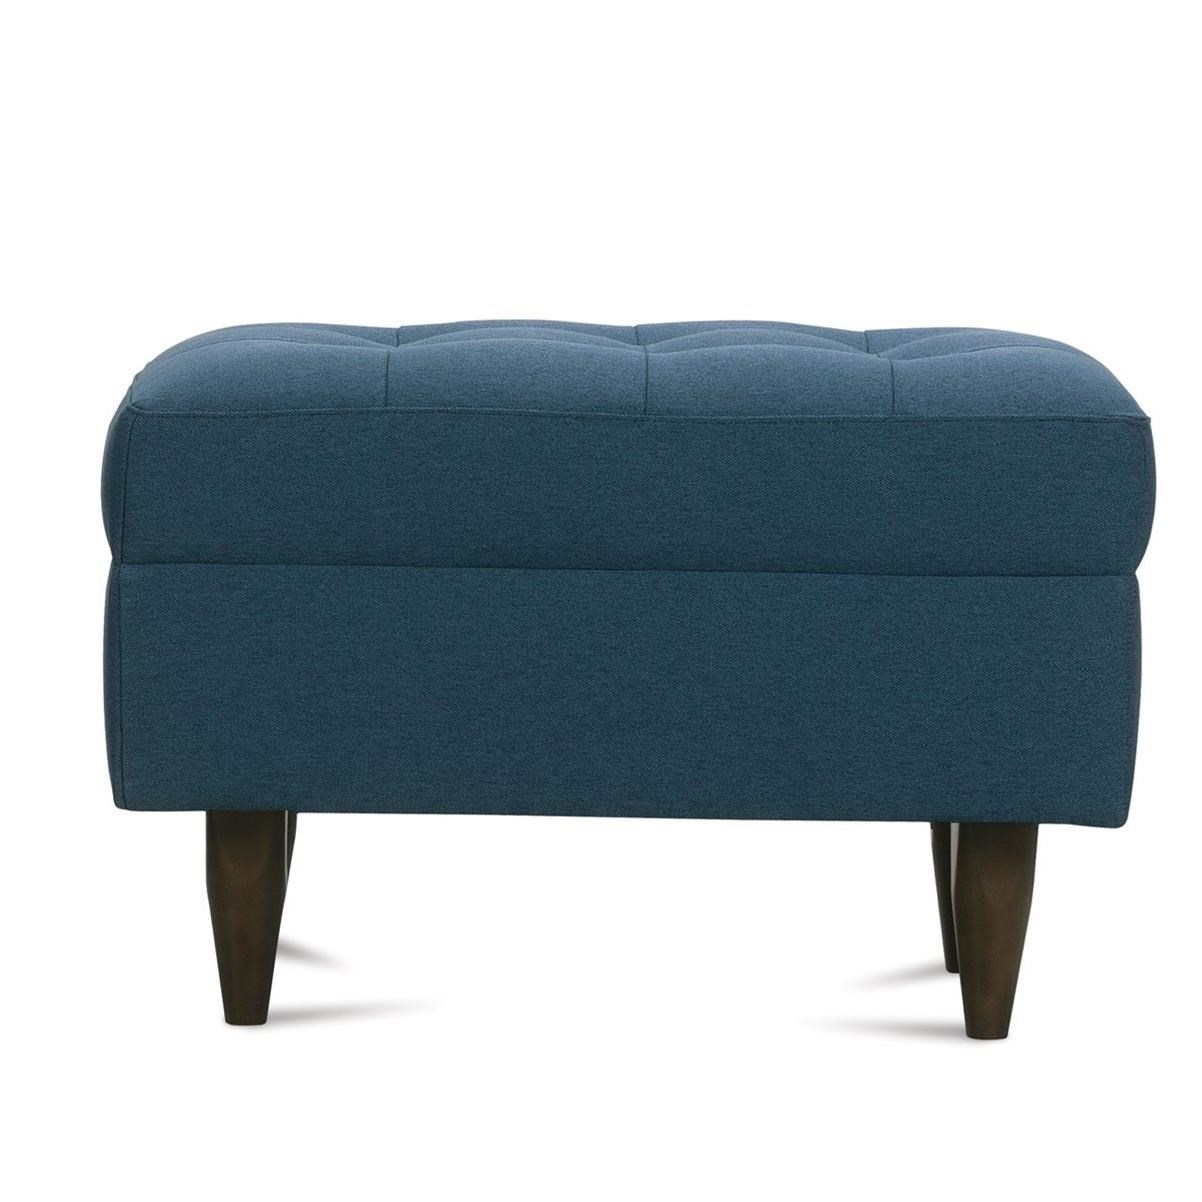 Modern Mix Ottoman by Rowe at Saugerties Furniture Mart